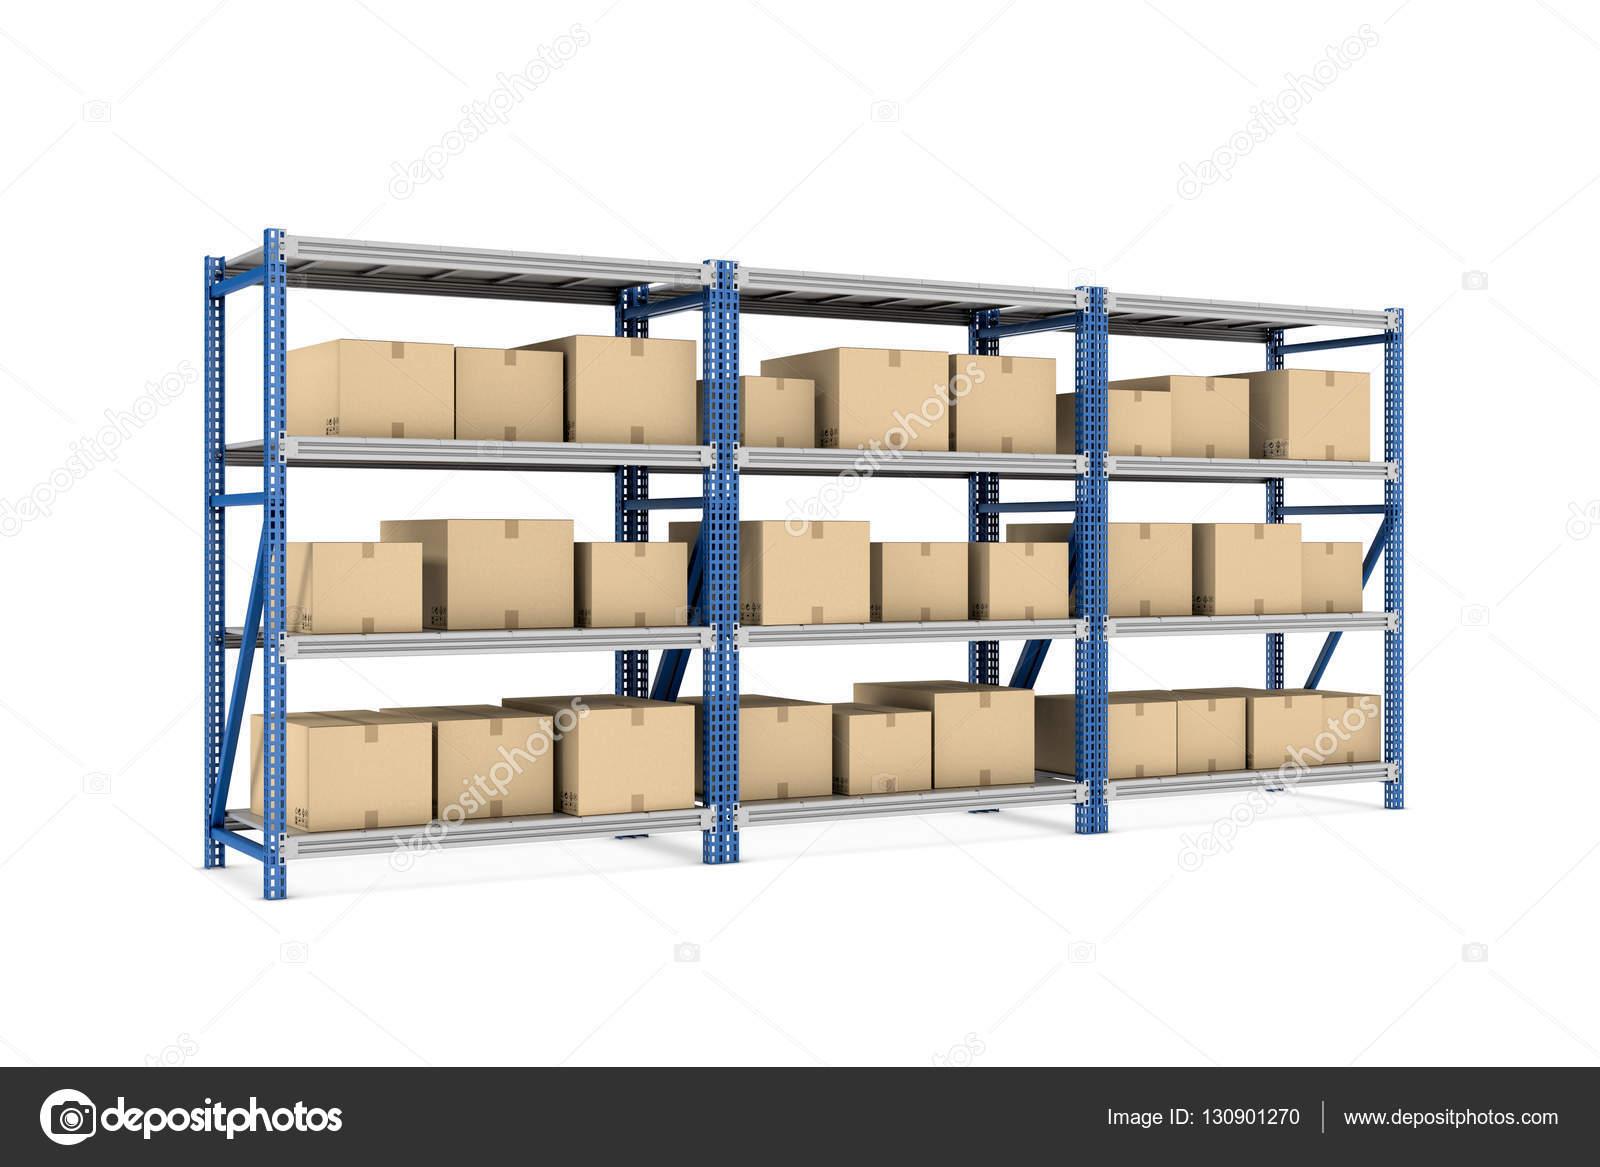 Representacin de tres estantes de metal con beiges cajas de cartn